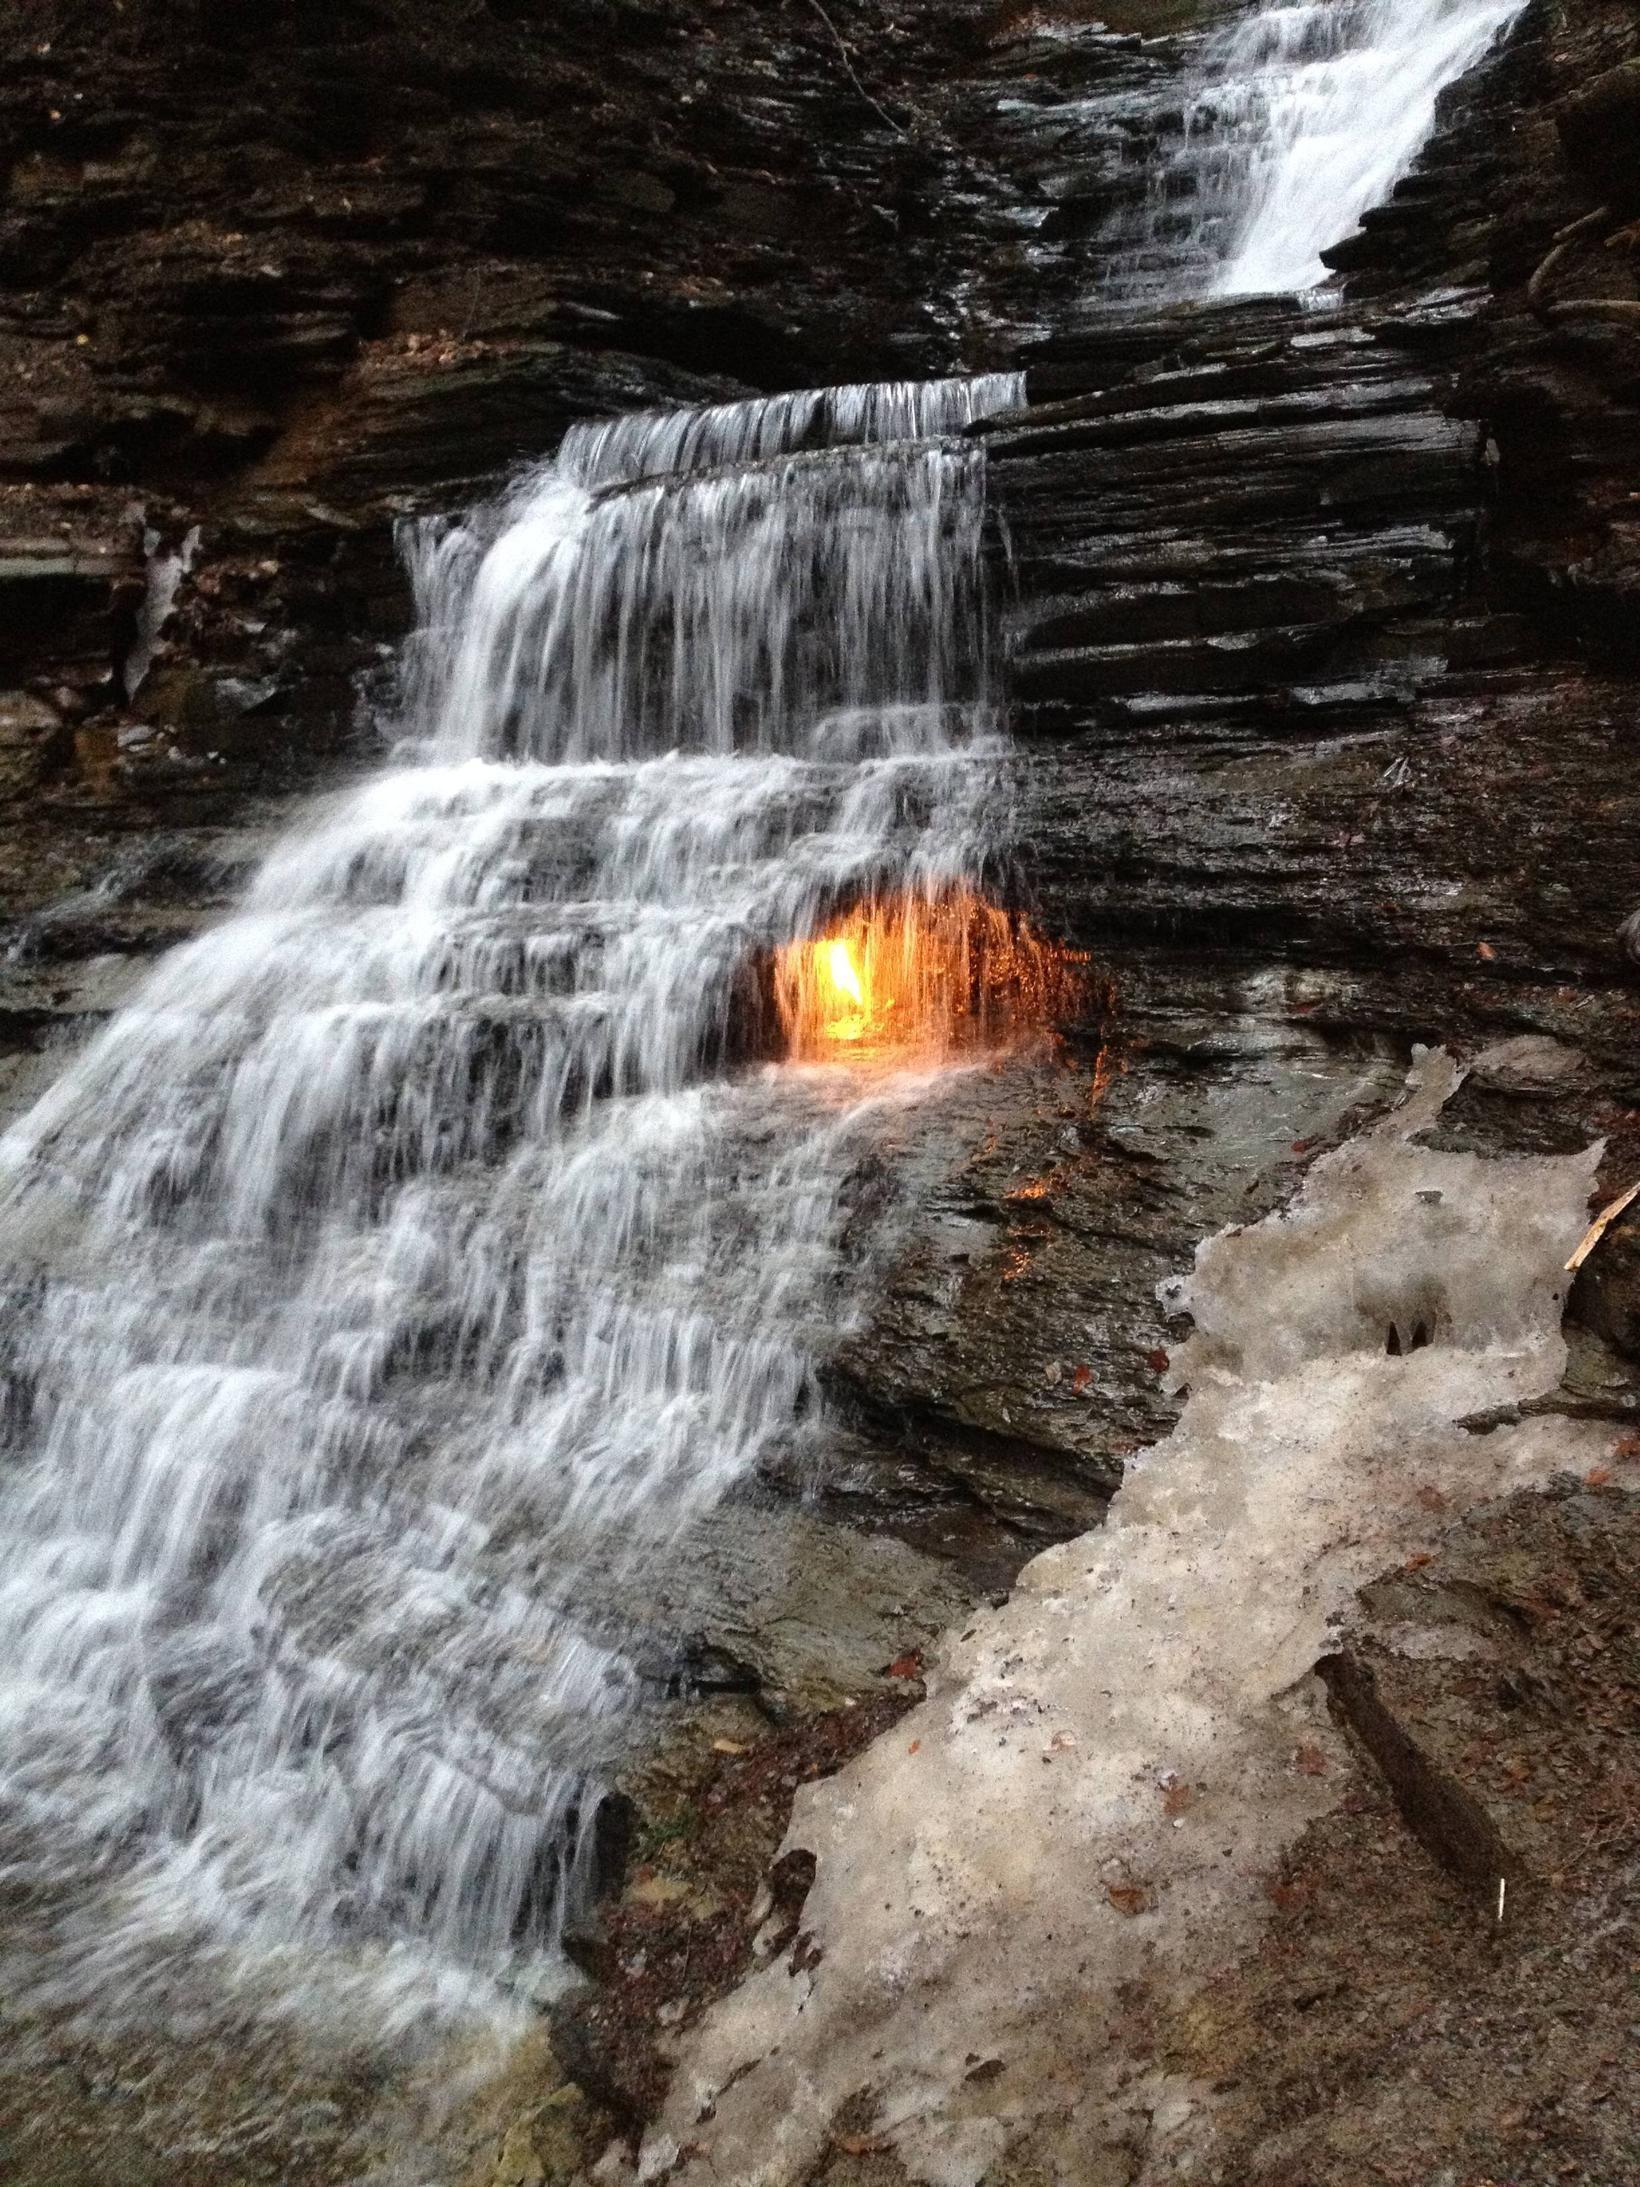 Chestnut Ridge Park Eternal Flame Falls Located Chestnut Ridge - Where is buffalo located